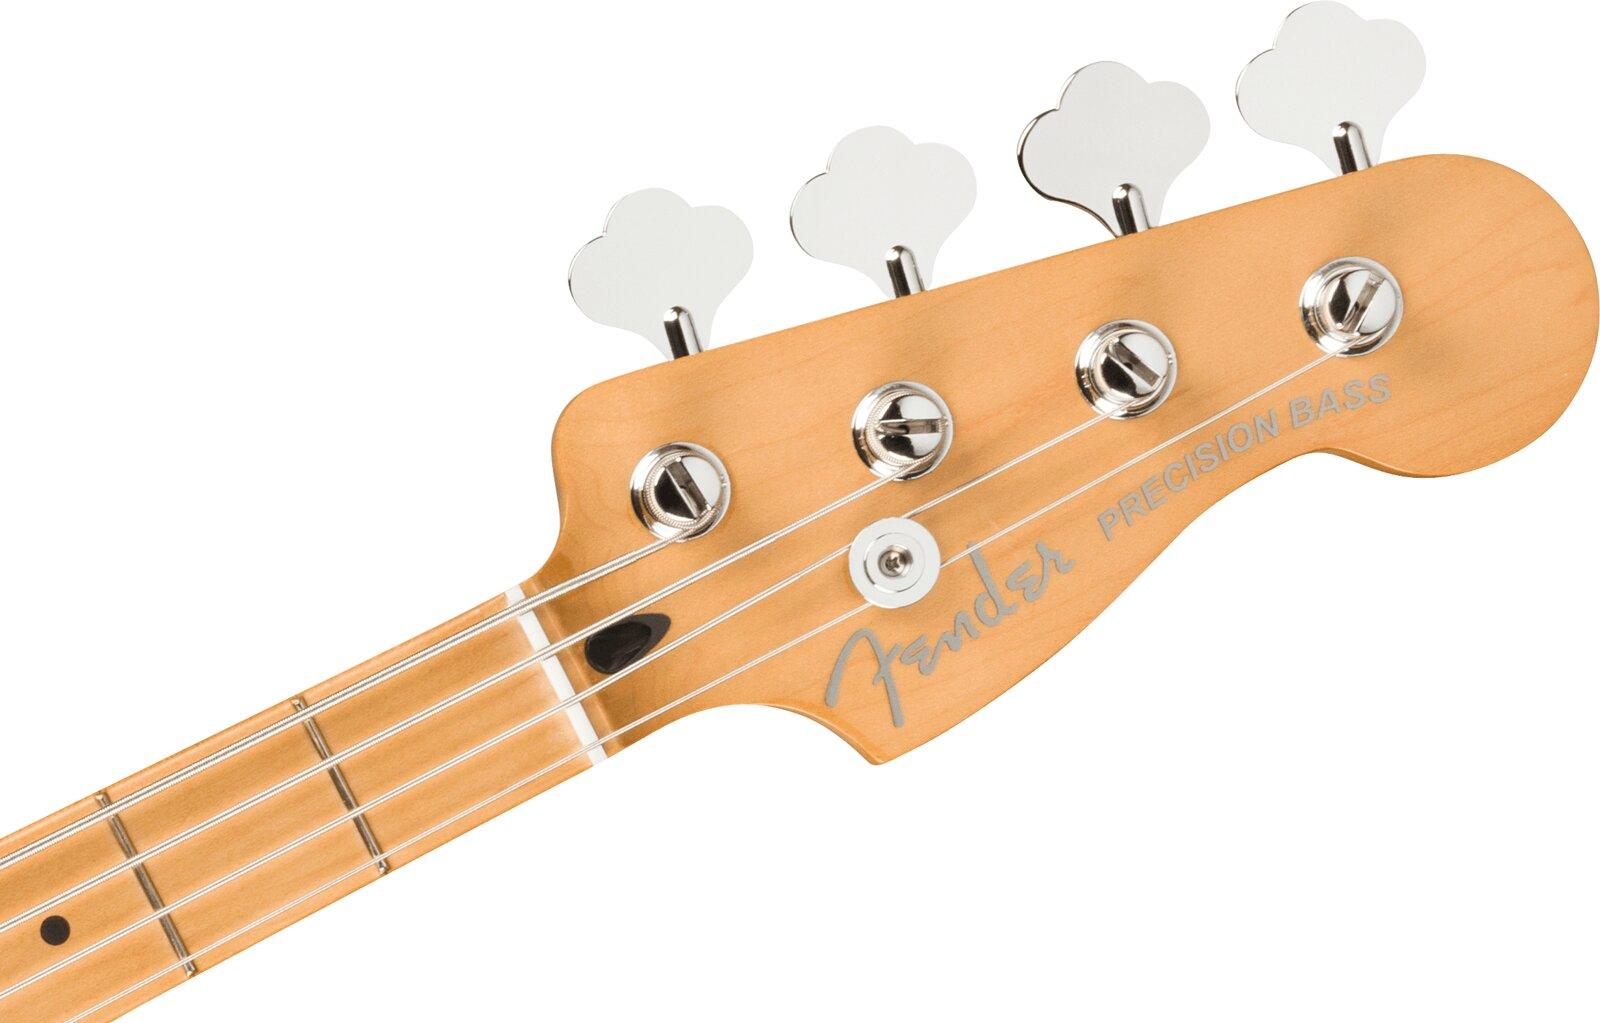 Fender Player Plus Precision Bass, Maple Fingerboard, Cosmic Jade : photo 3